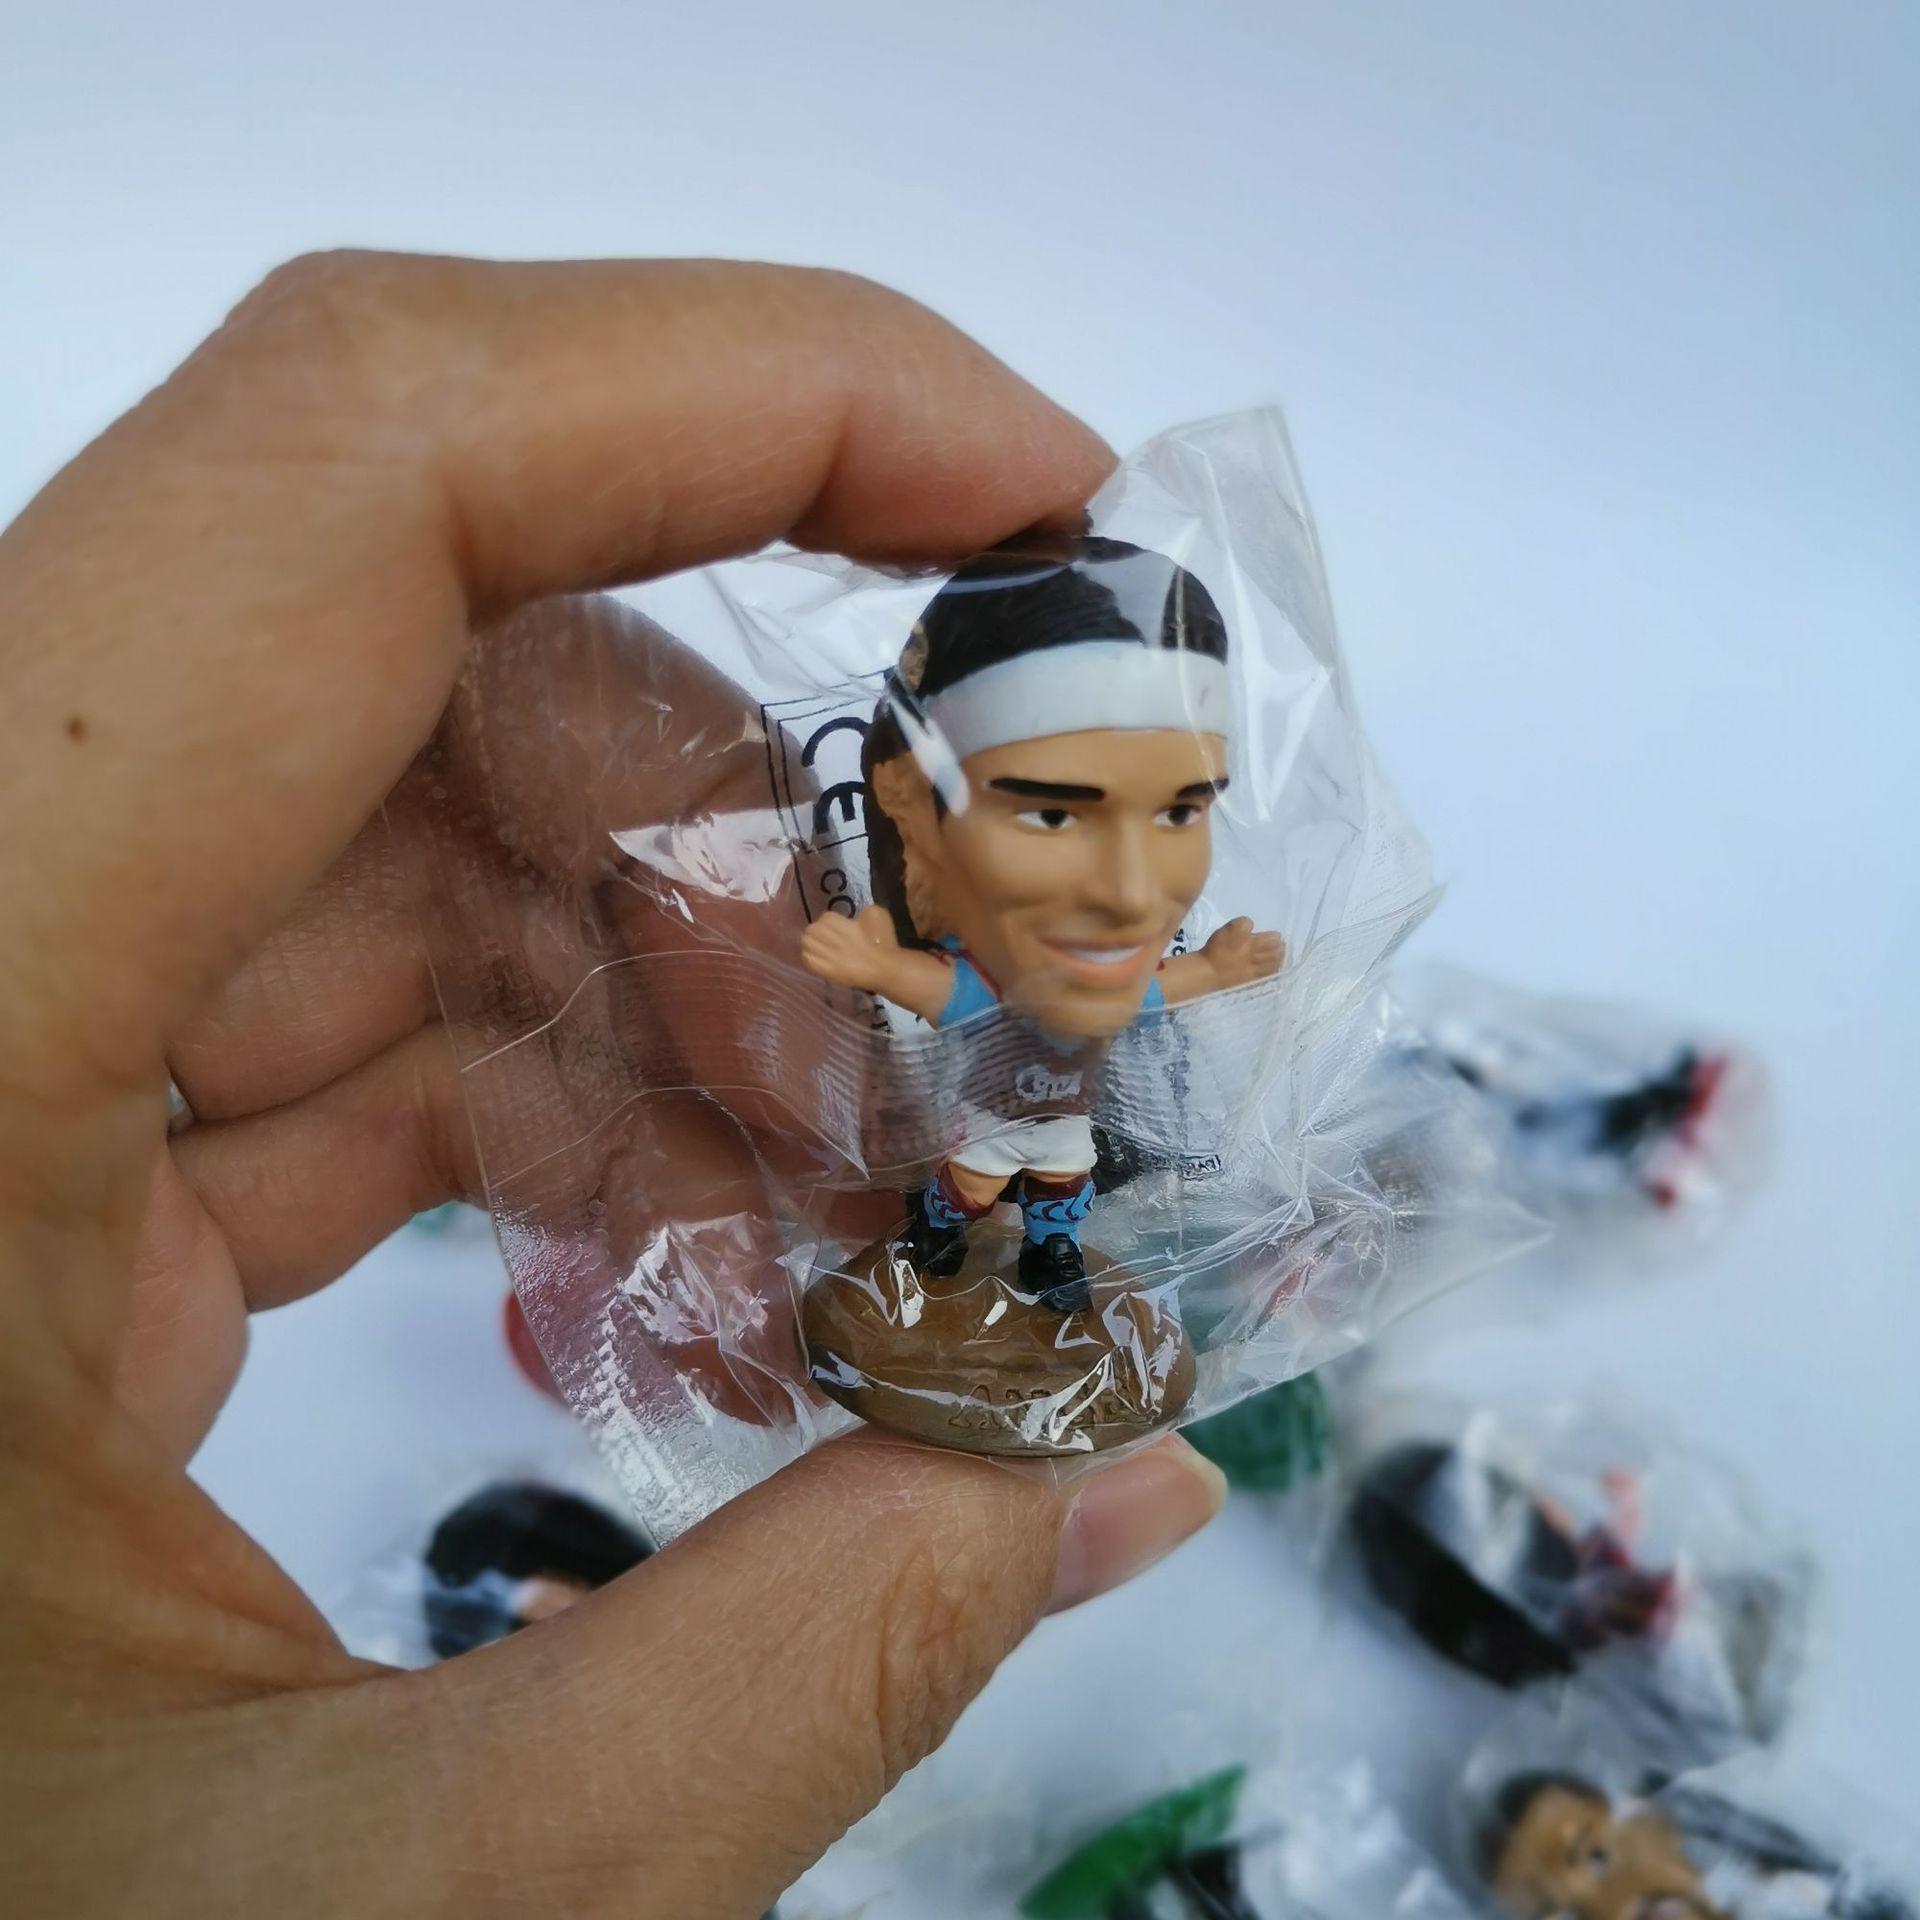 10pcs/lot Cartoon action figures football player stars athlete car decoration ornament cake accessories kids toys